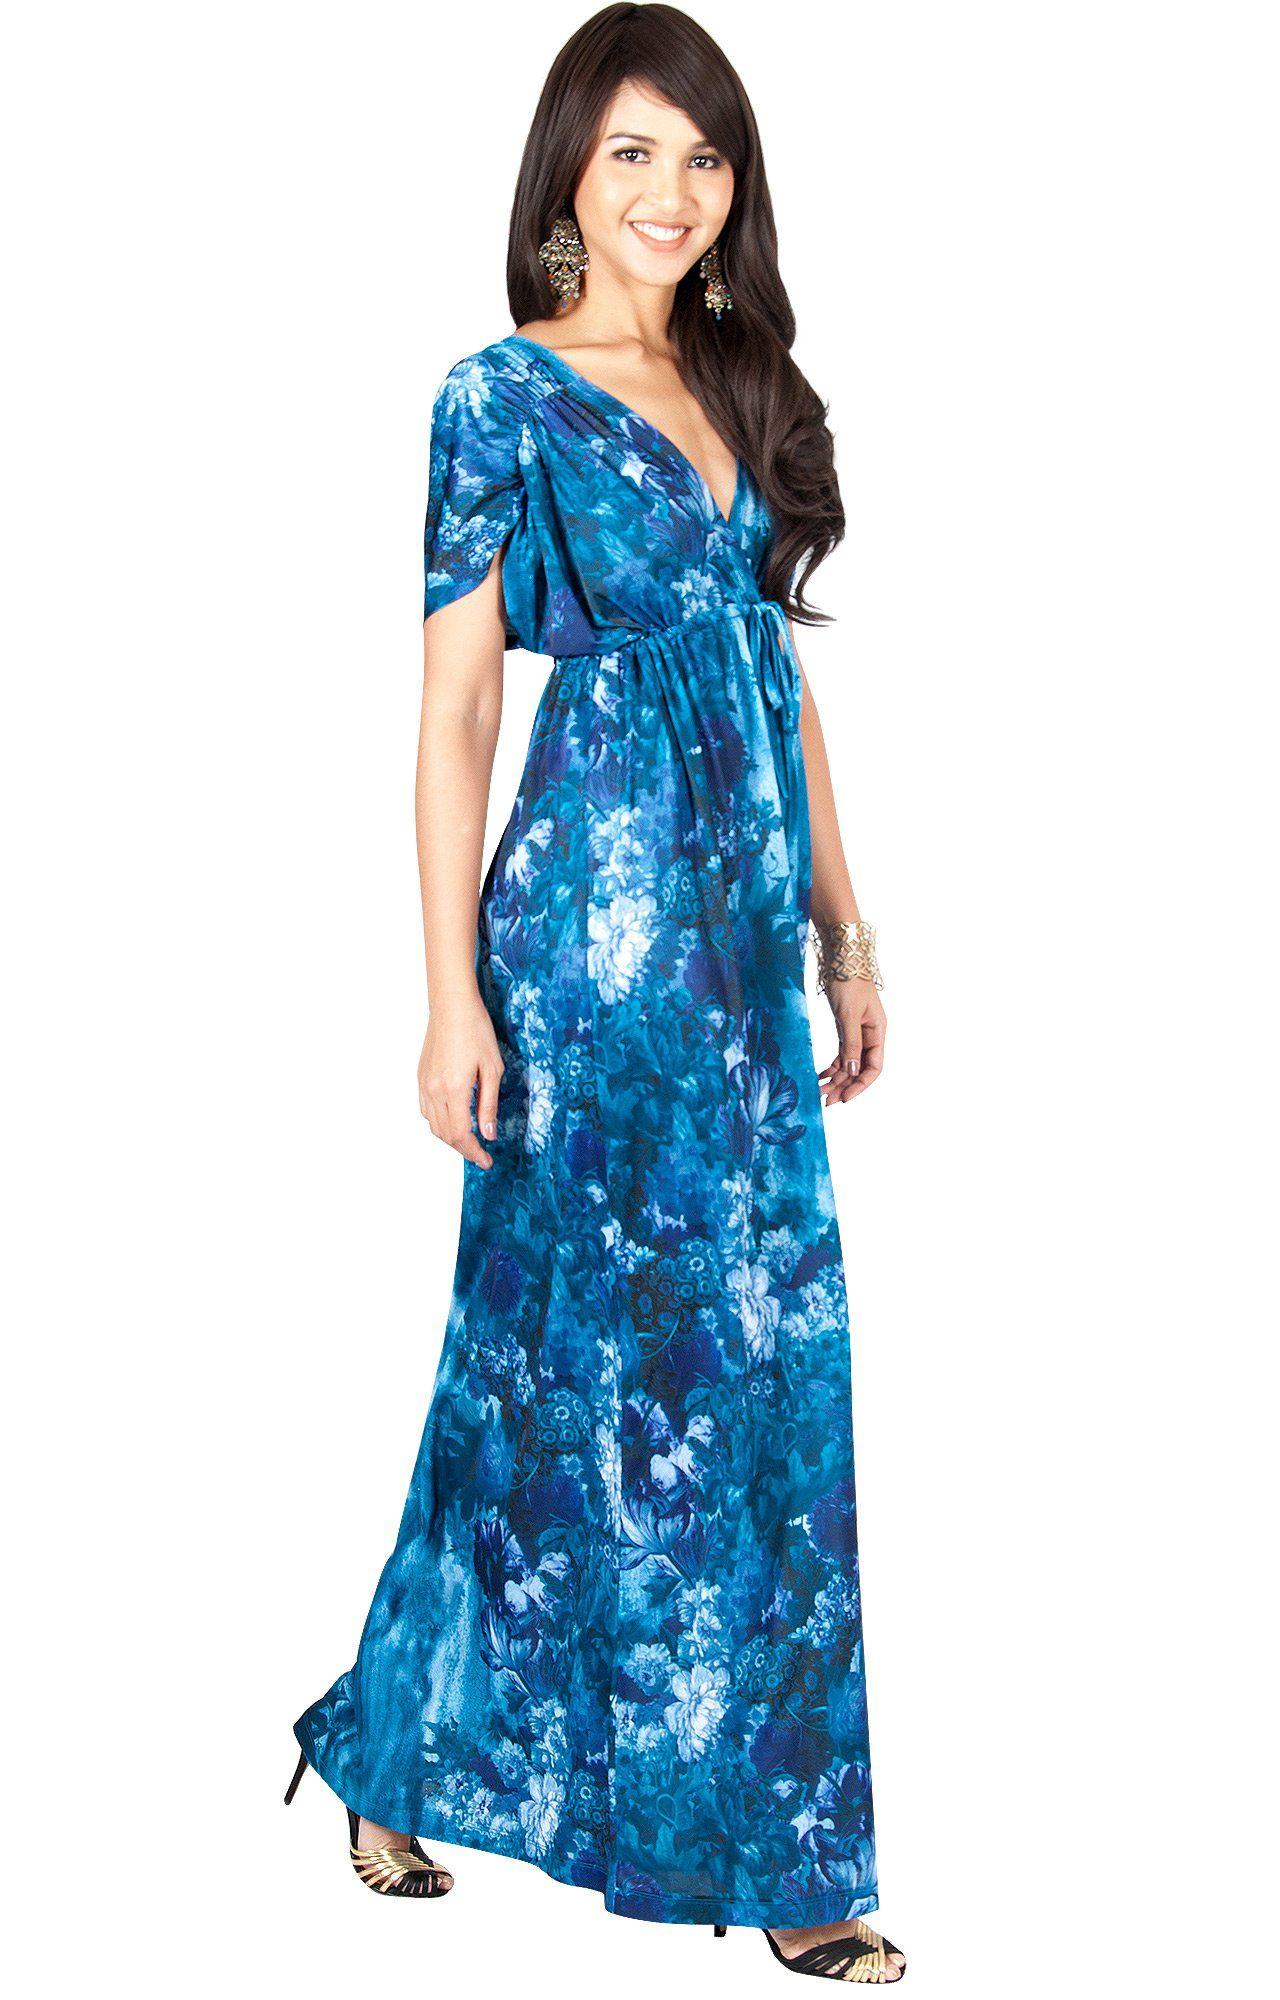 44481137649 KOH KOH Womens Long VNeck Short Kimono Sleeve Summer Flowy Casual Cute  Sundress Floral Print Vintage Evening Sexy Sundresses Gown Gowns Maxi Dress  Dresses ...